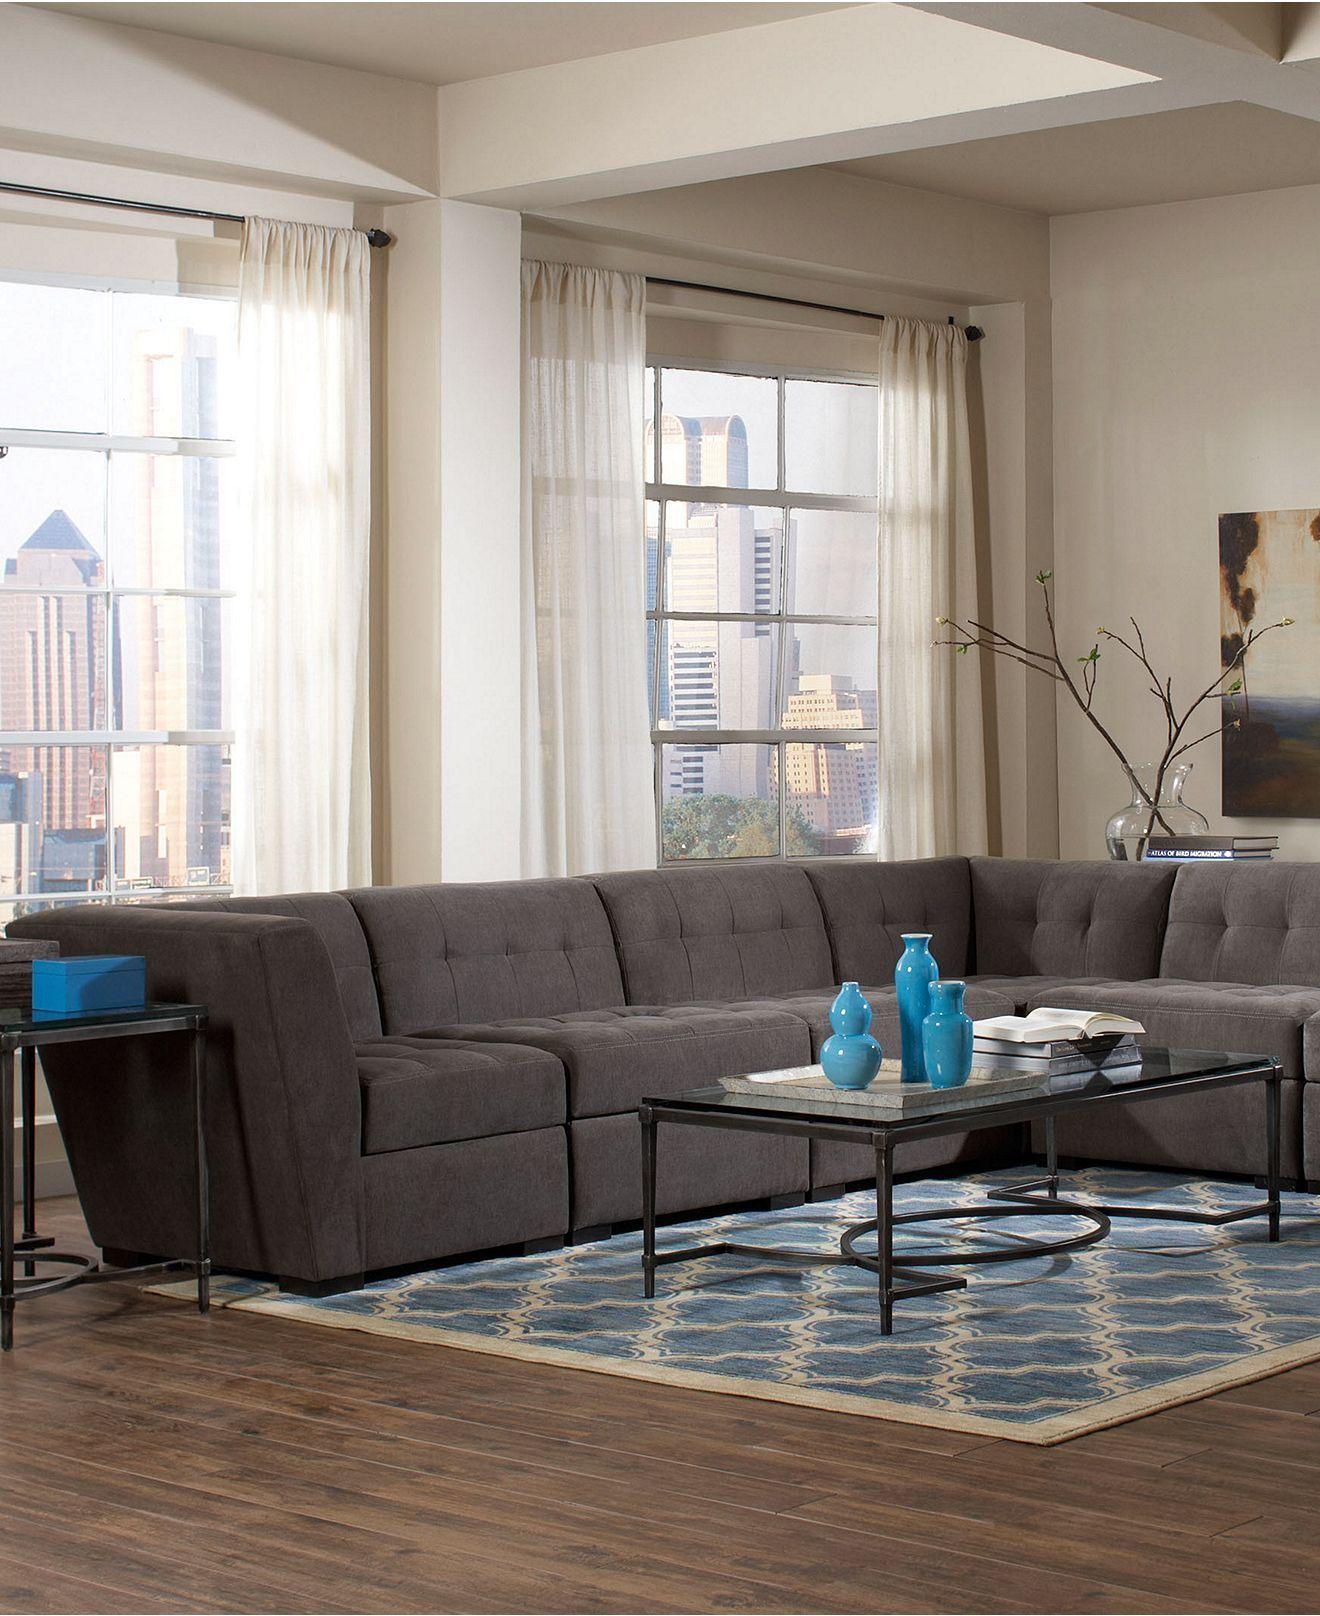 charming modern furniture living room corner fabric sofa sectional mcno422 | Roxanne Fabric Modular Living Room Furniture Collection ...